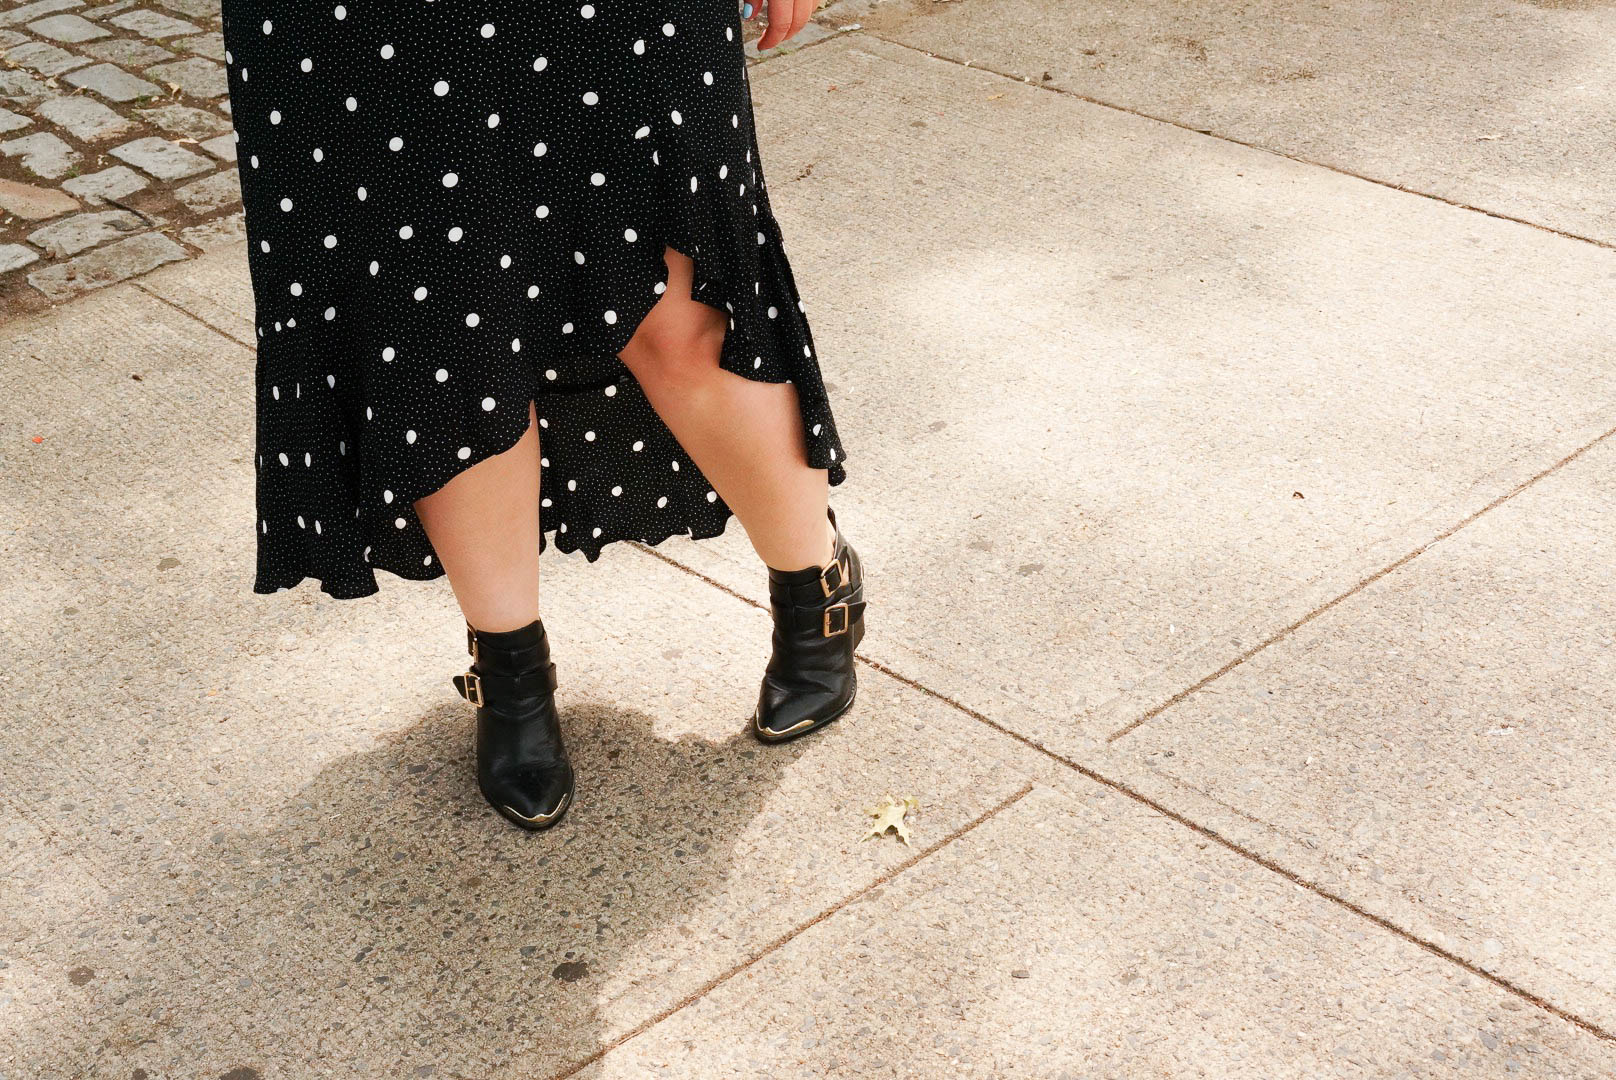 Polka Dot Dress - Shoes